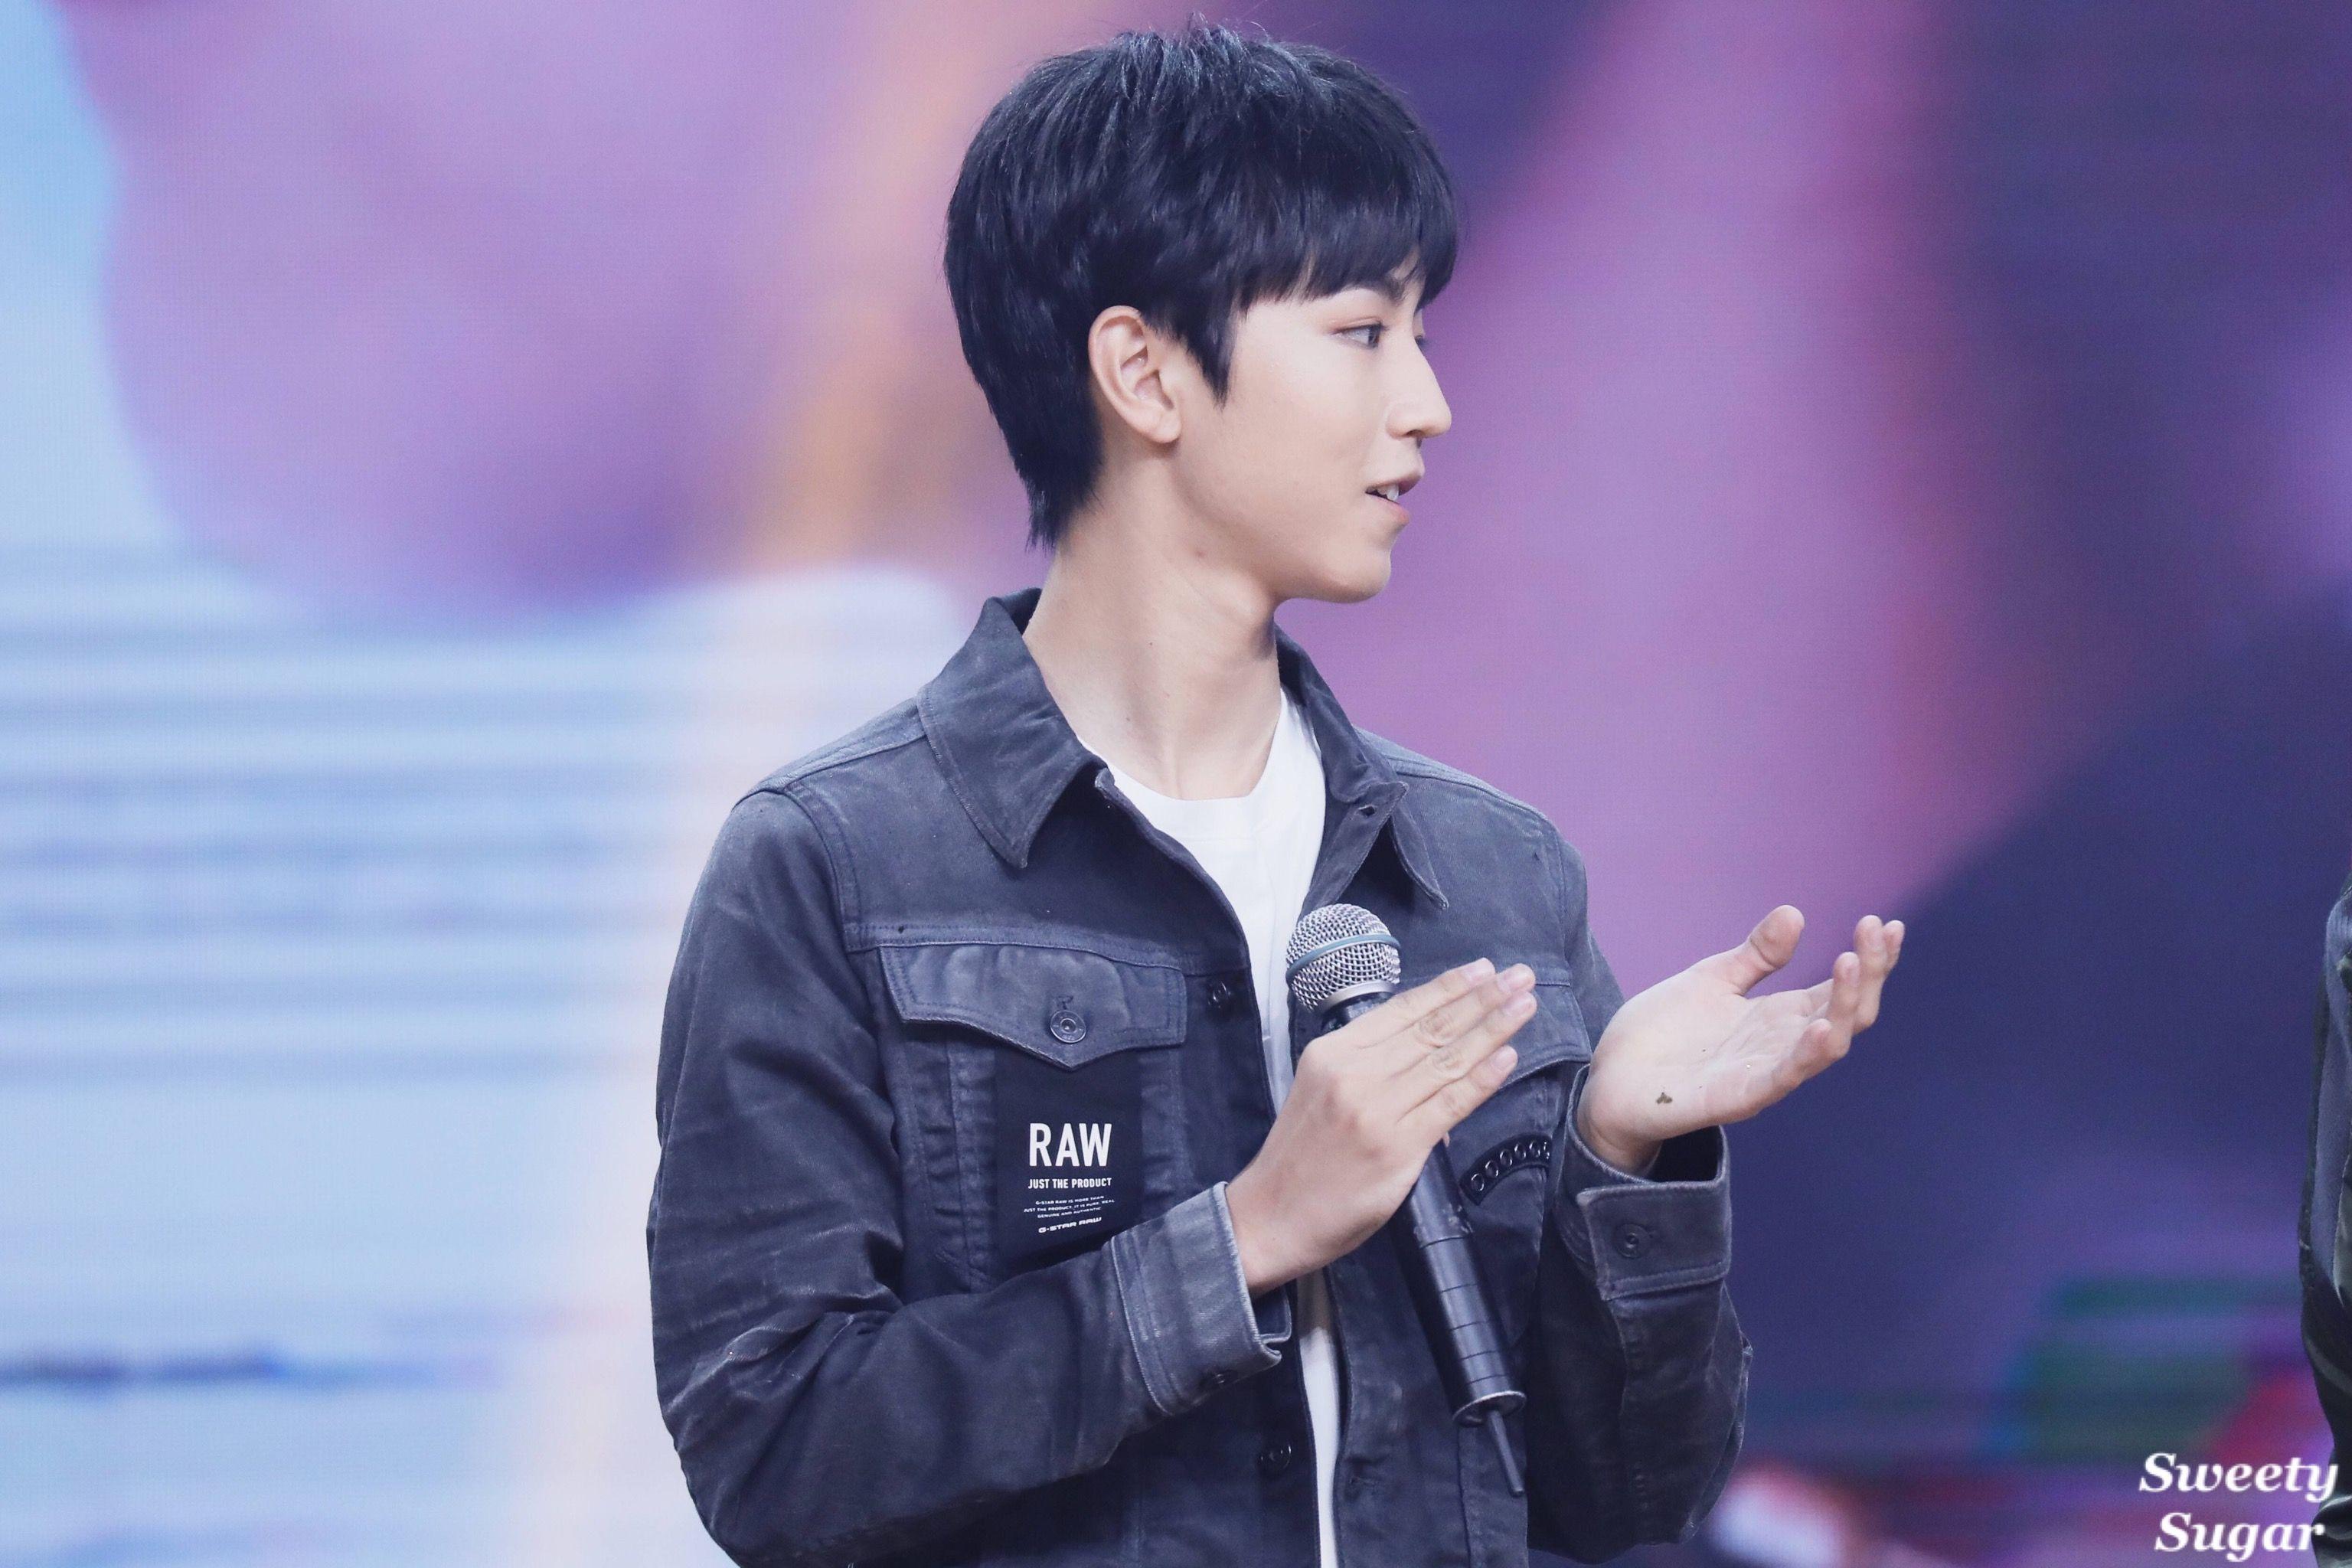 161128 Wang Junkai #WJK #Karry #KarryWang #王俊凯 #หวังจุนไค #จุนไค #TFboys #Happy16thBirthdayYiyangqianxi